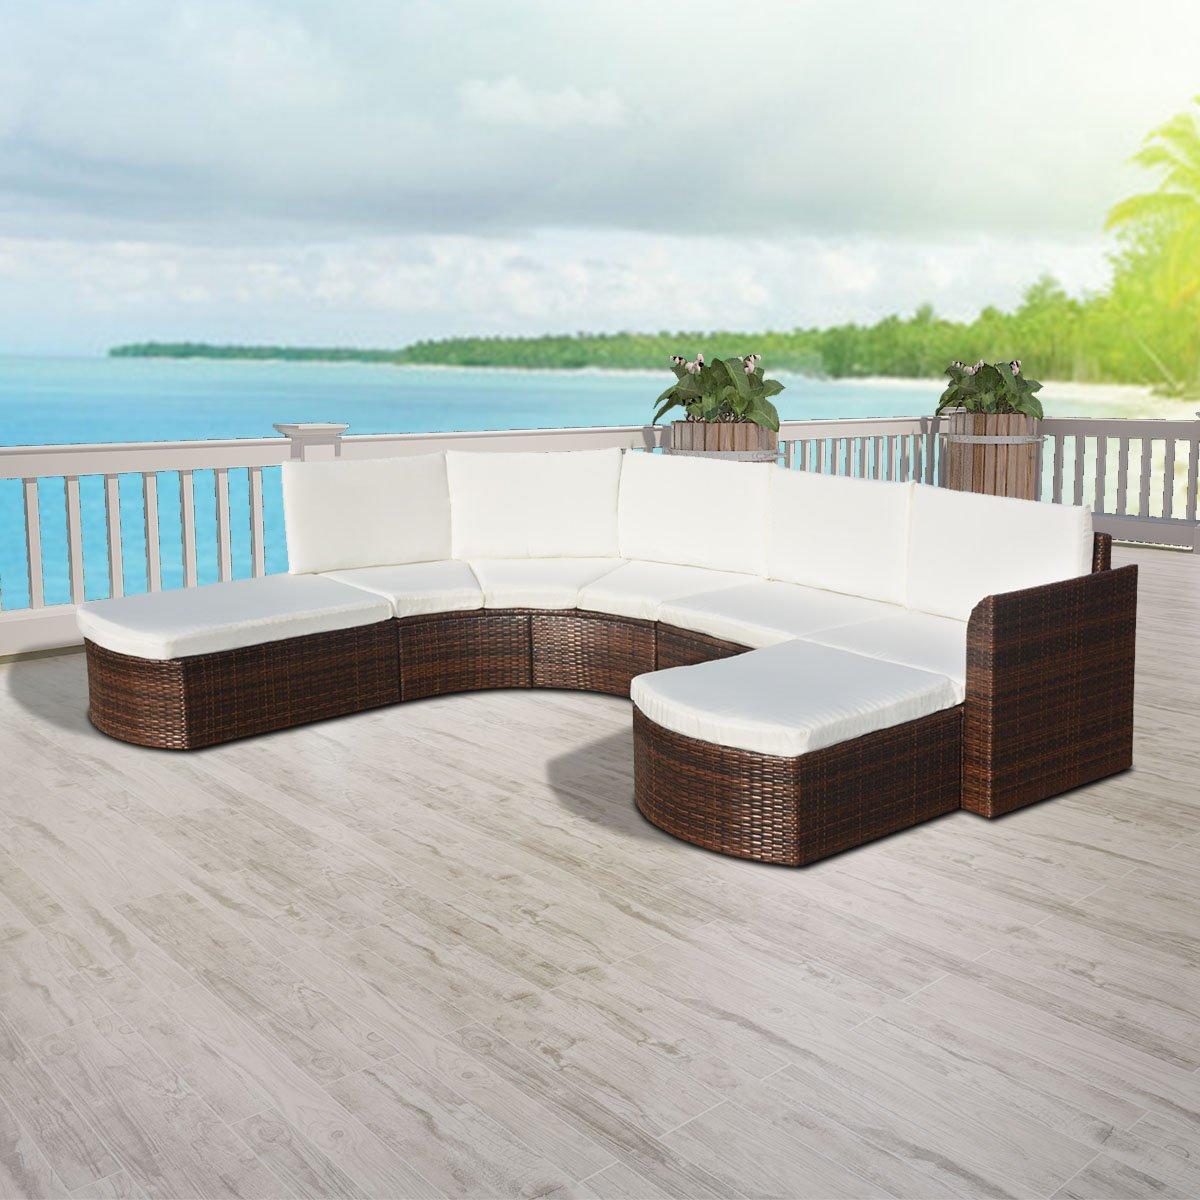 vidaXL 16tlg. Sofa Set Poly Rattan Sitzgruppe Lounge Gartenmöbel Gartengarnitur Braun